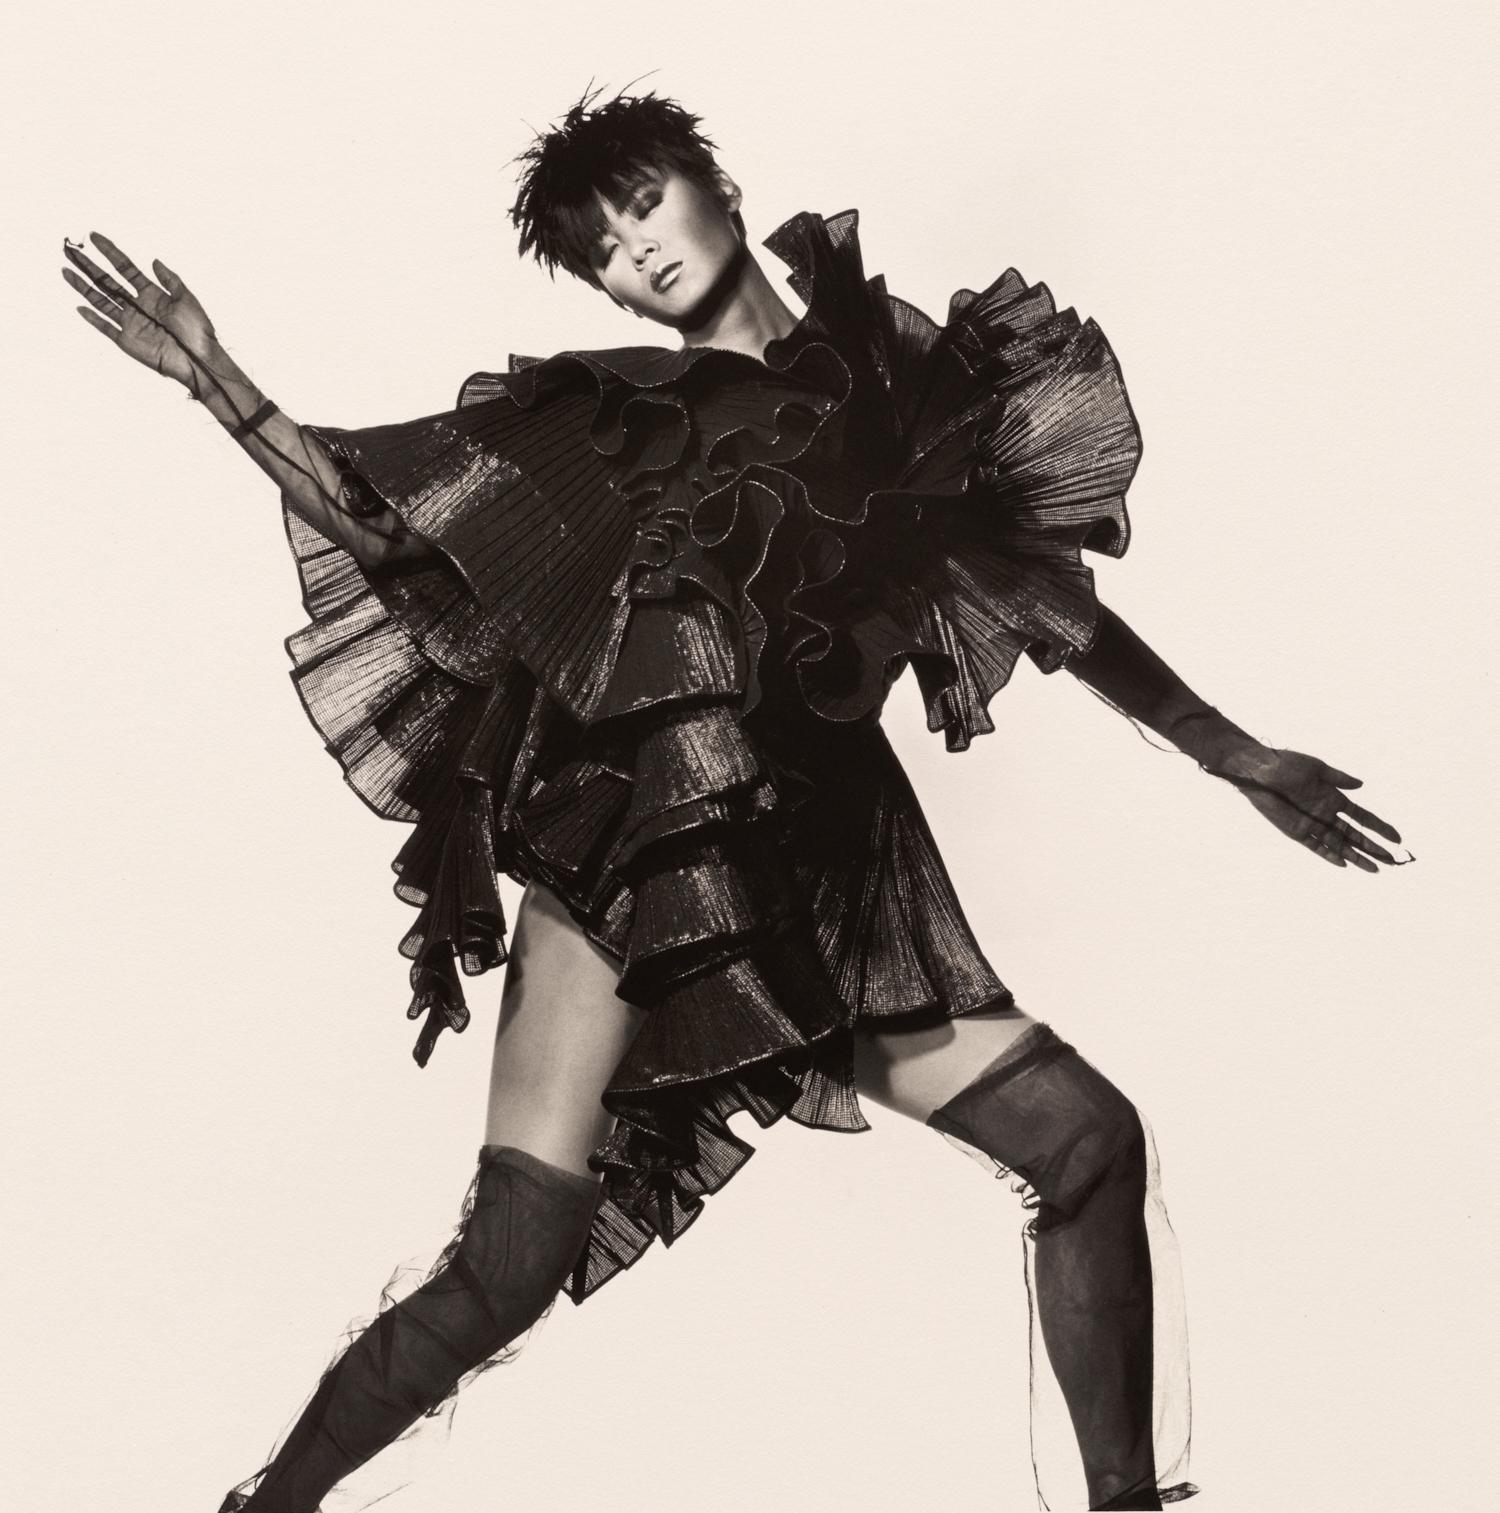 Issey Miyake Seaweed Dress , New York, 1987 Platinum-palladium print © The Irving Penn Foundation